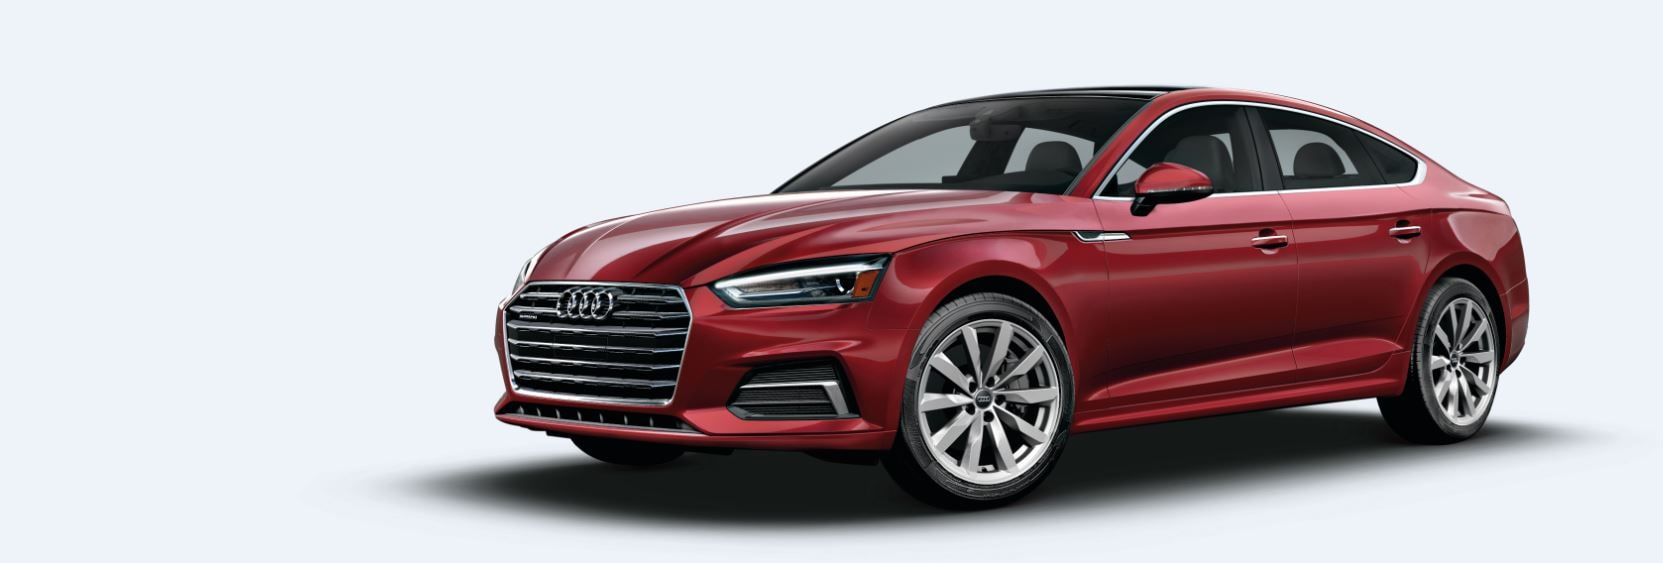 New Audi A5 Sportback For Sale at Rockville Audi